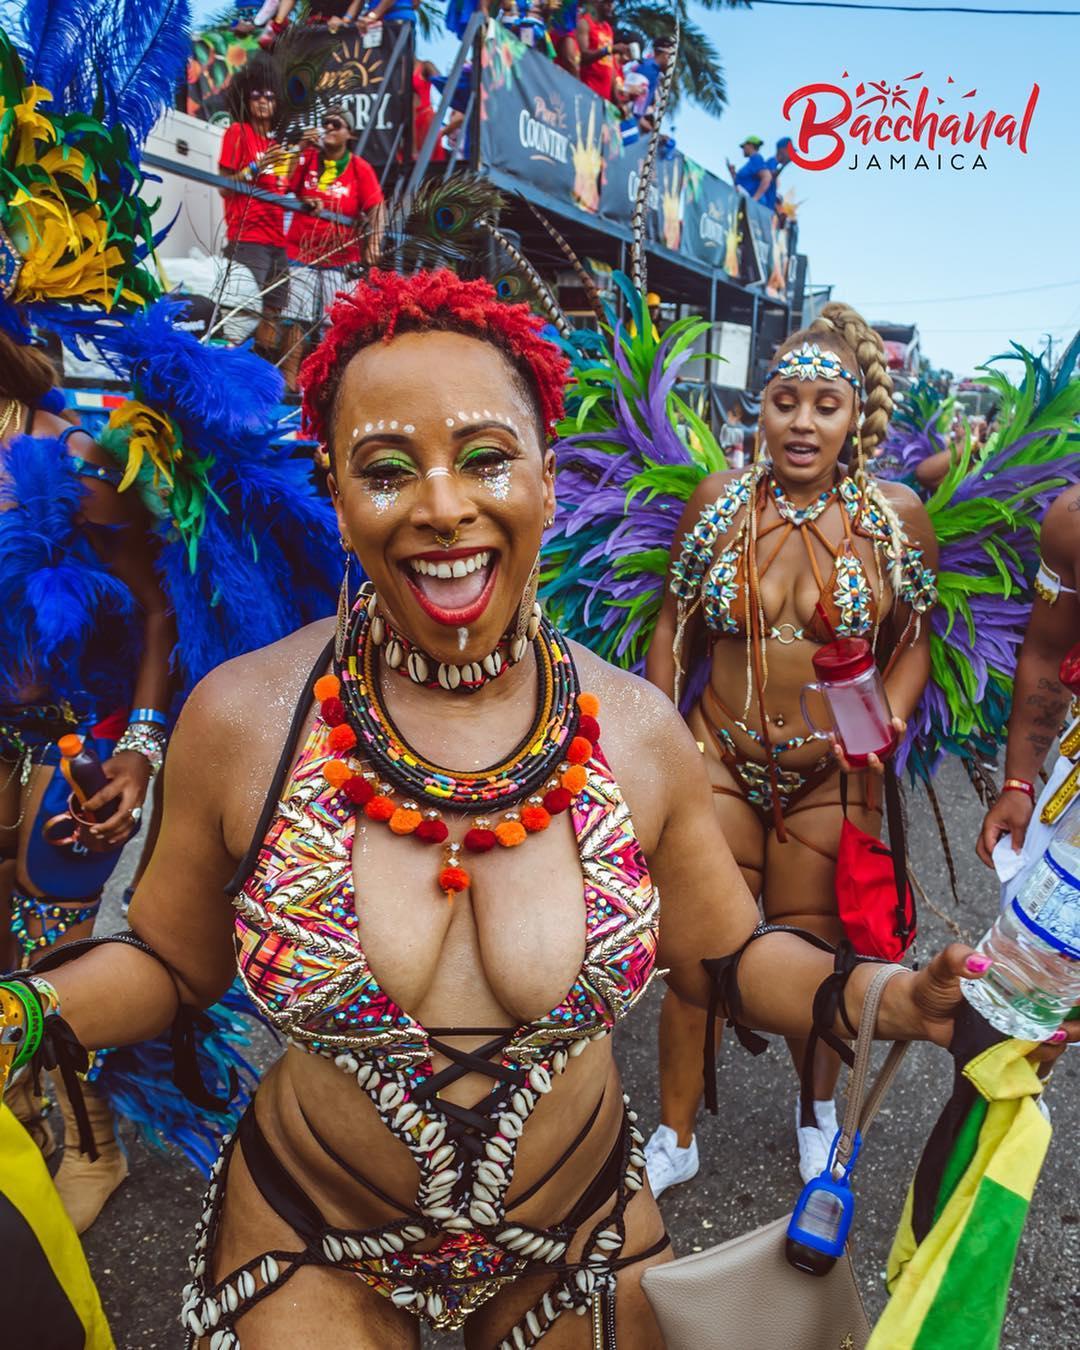 Bacchanal Jamaica 6